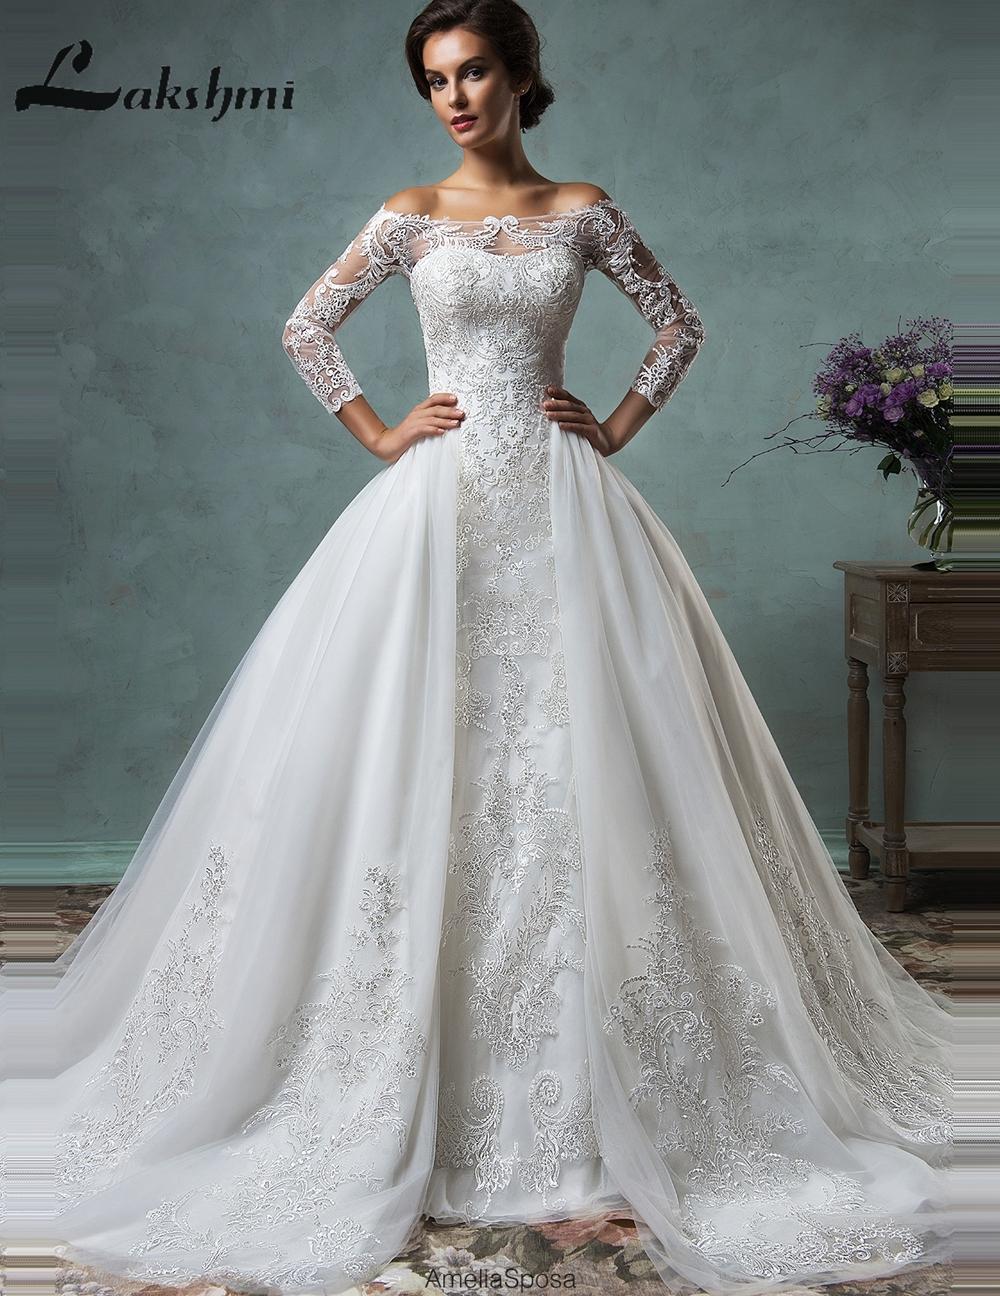 Wedding Dresses Lace Full Skirt : Popular detachable wedding dress buy cheap